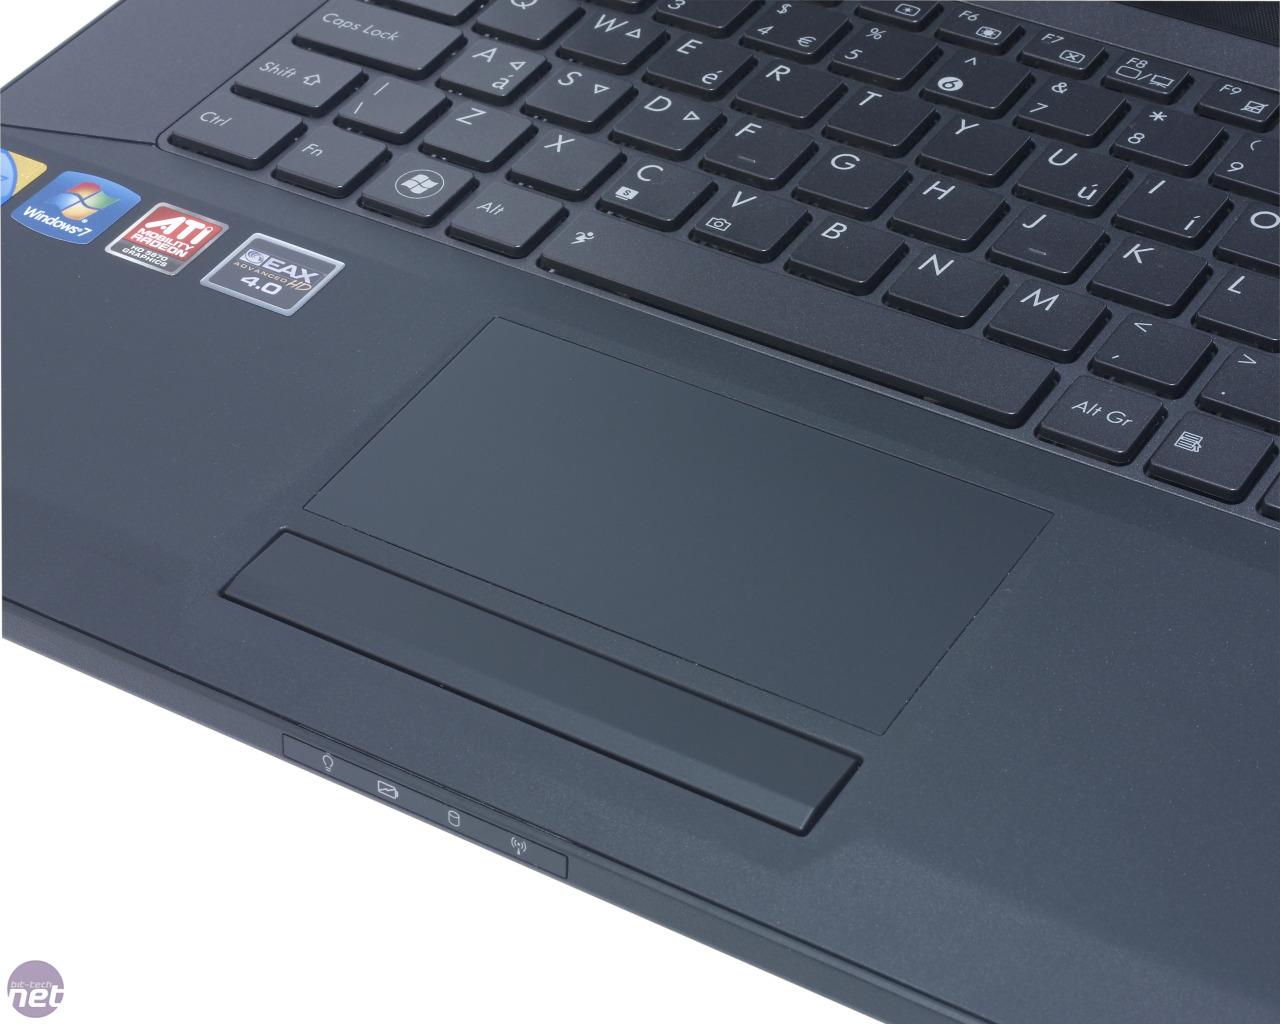 Asus G73 Gaming Laptop Review | bit-tech net